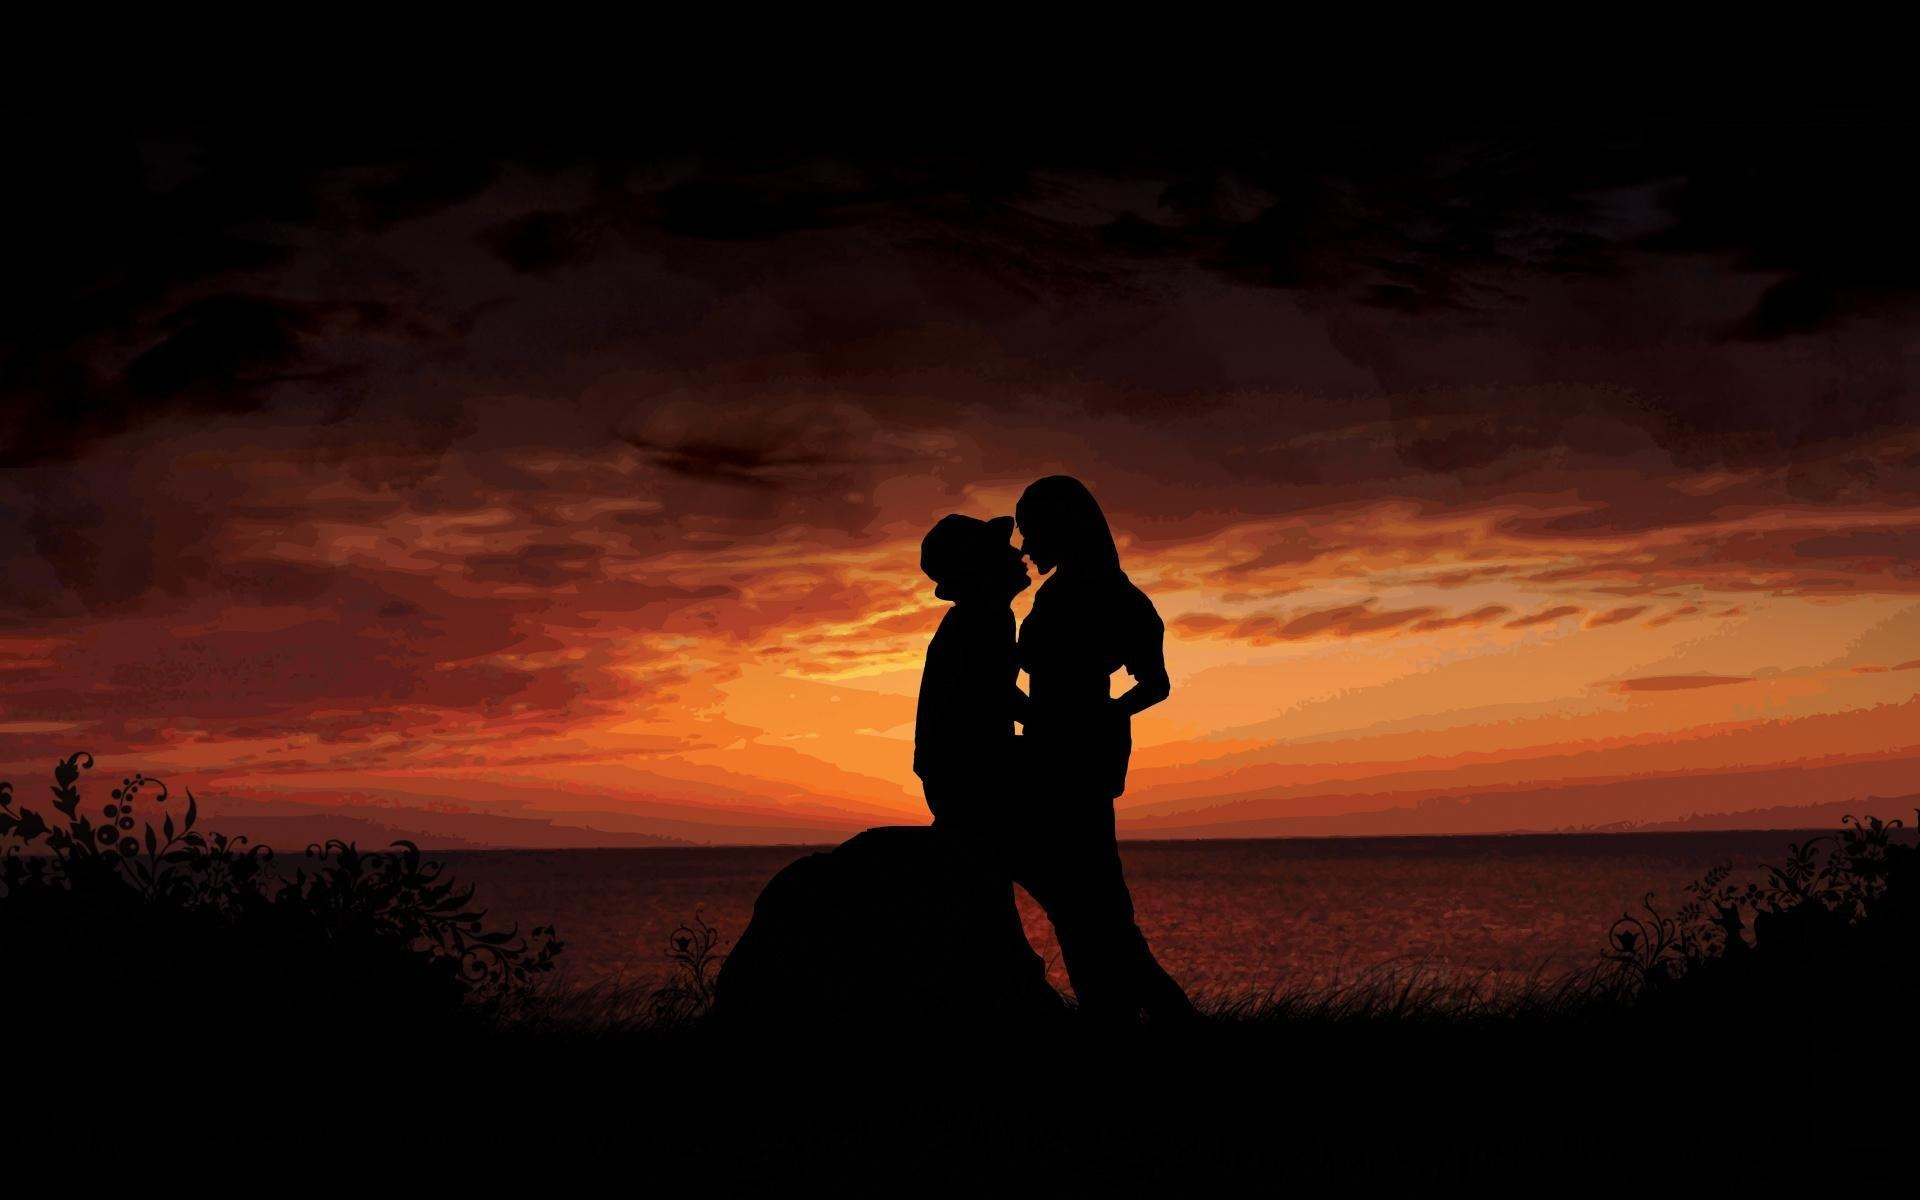 Download Wallpaper Night Couple - Image-Couple-Wallpapers-009  Snapshot.jpg